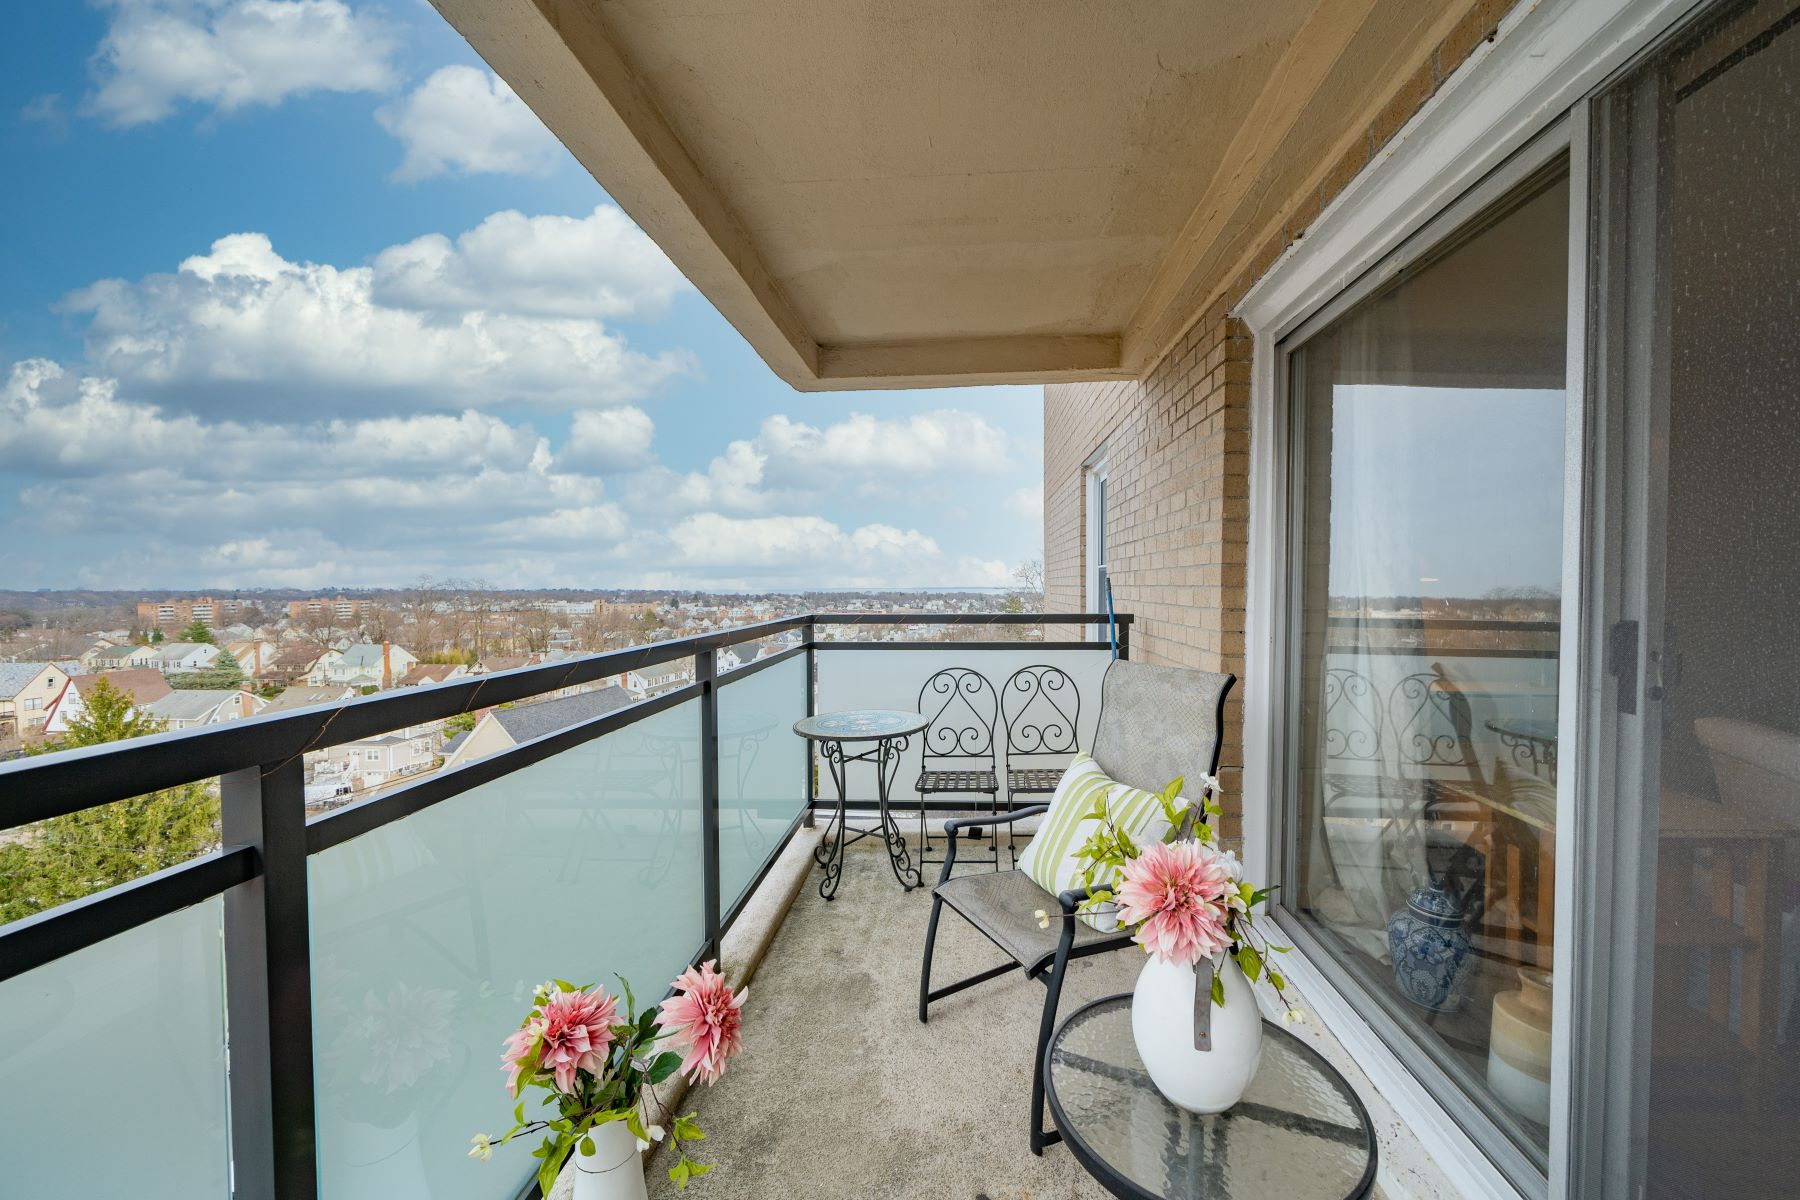 Co-op Properties 為 出售 在 Enjoy the Morning Sun on the Over-sized Balcony! 377 Westchester Avenue, 6E, Port Chester, 纽约 10573 美國